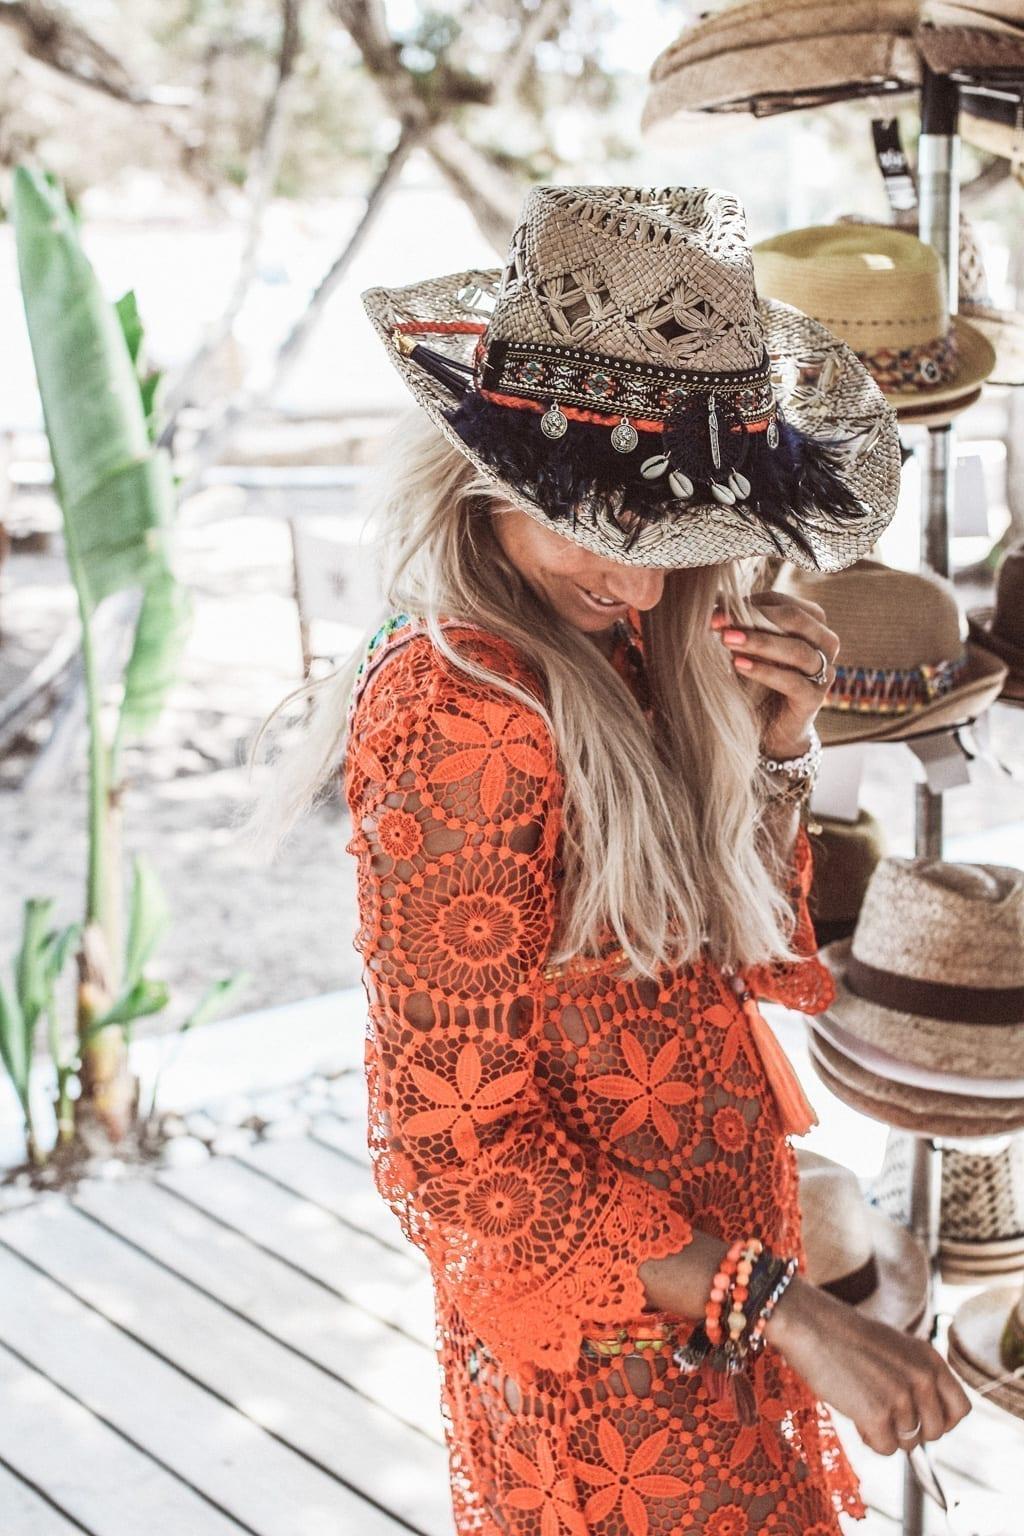 CK1603_Constantly-K-Karin-Kaswurm-Ibiza-Beach-Hippie-Boho-Style-Blog-7939